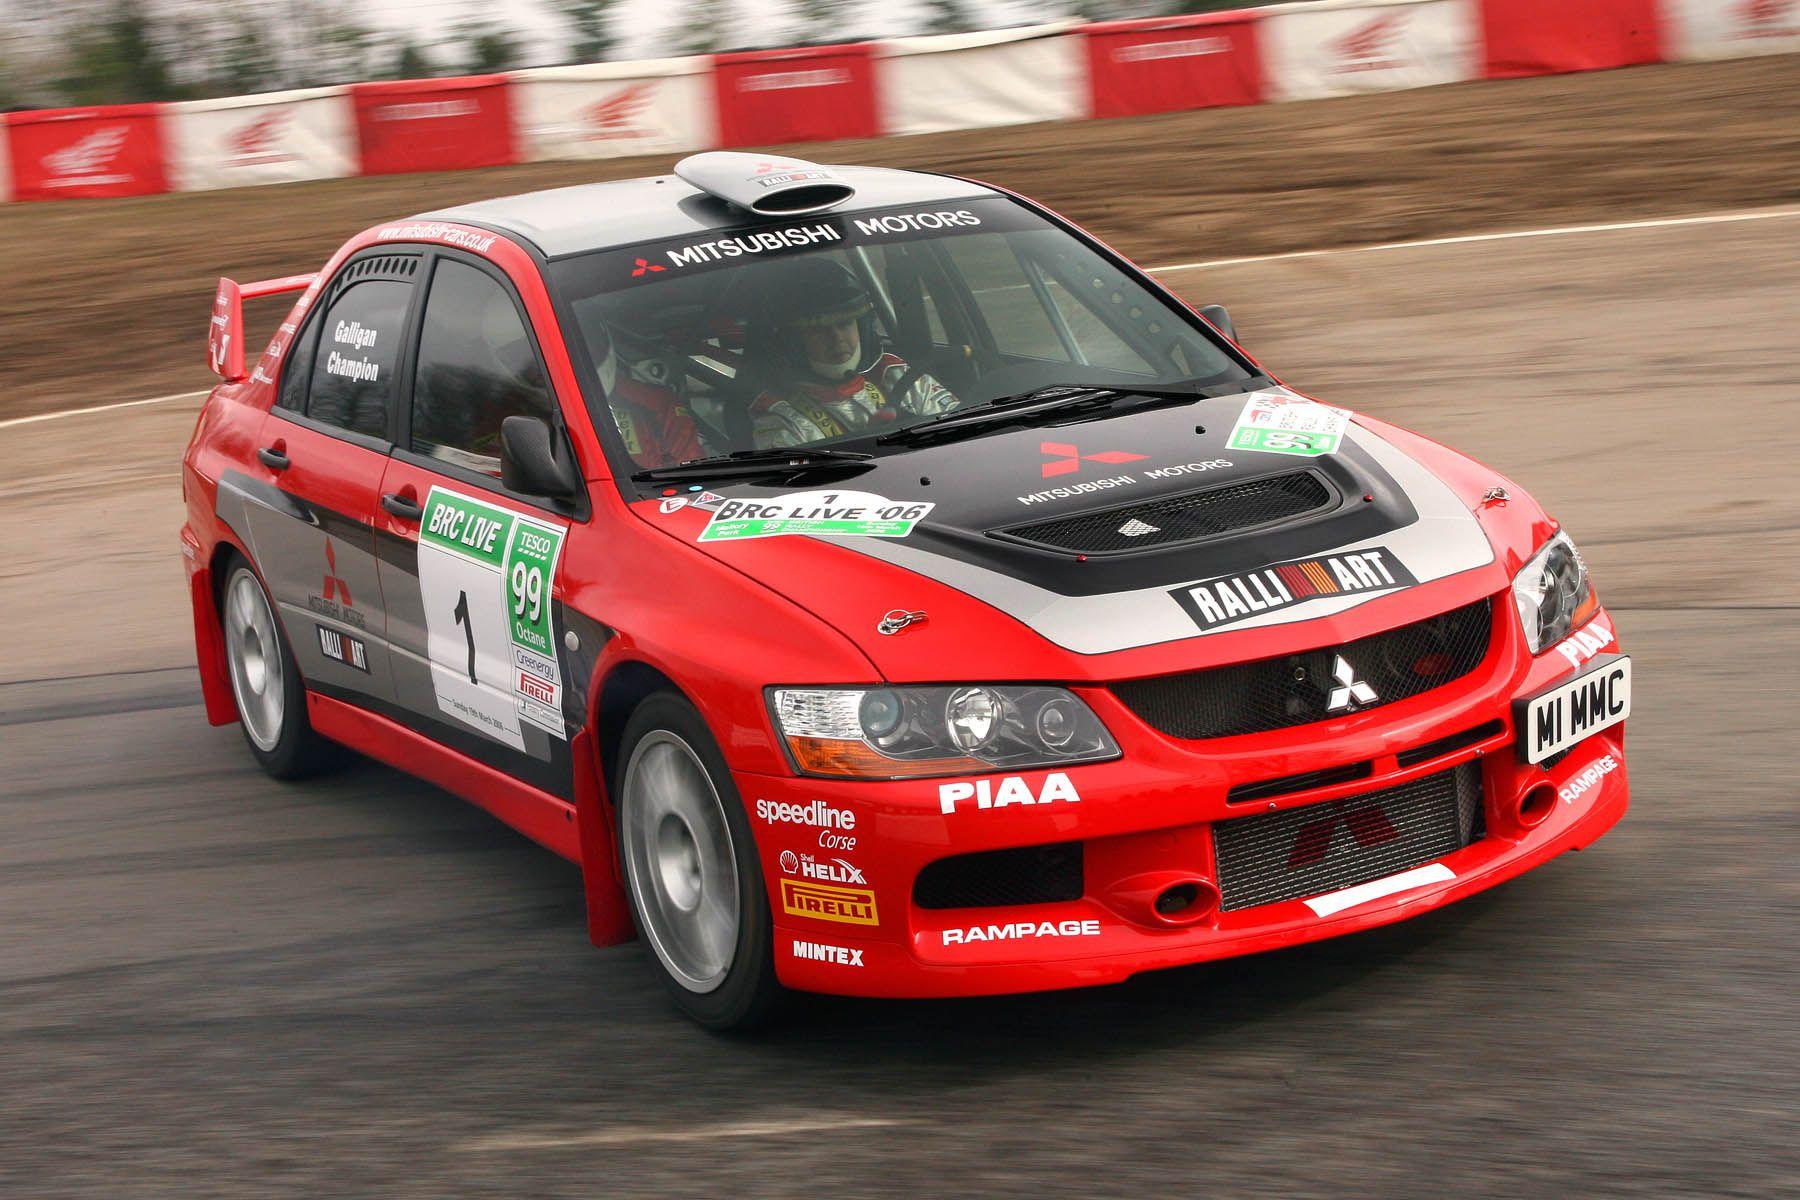 rally evo | Evos | Pinterest | Evo, Rally and Rally car